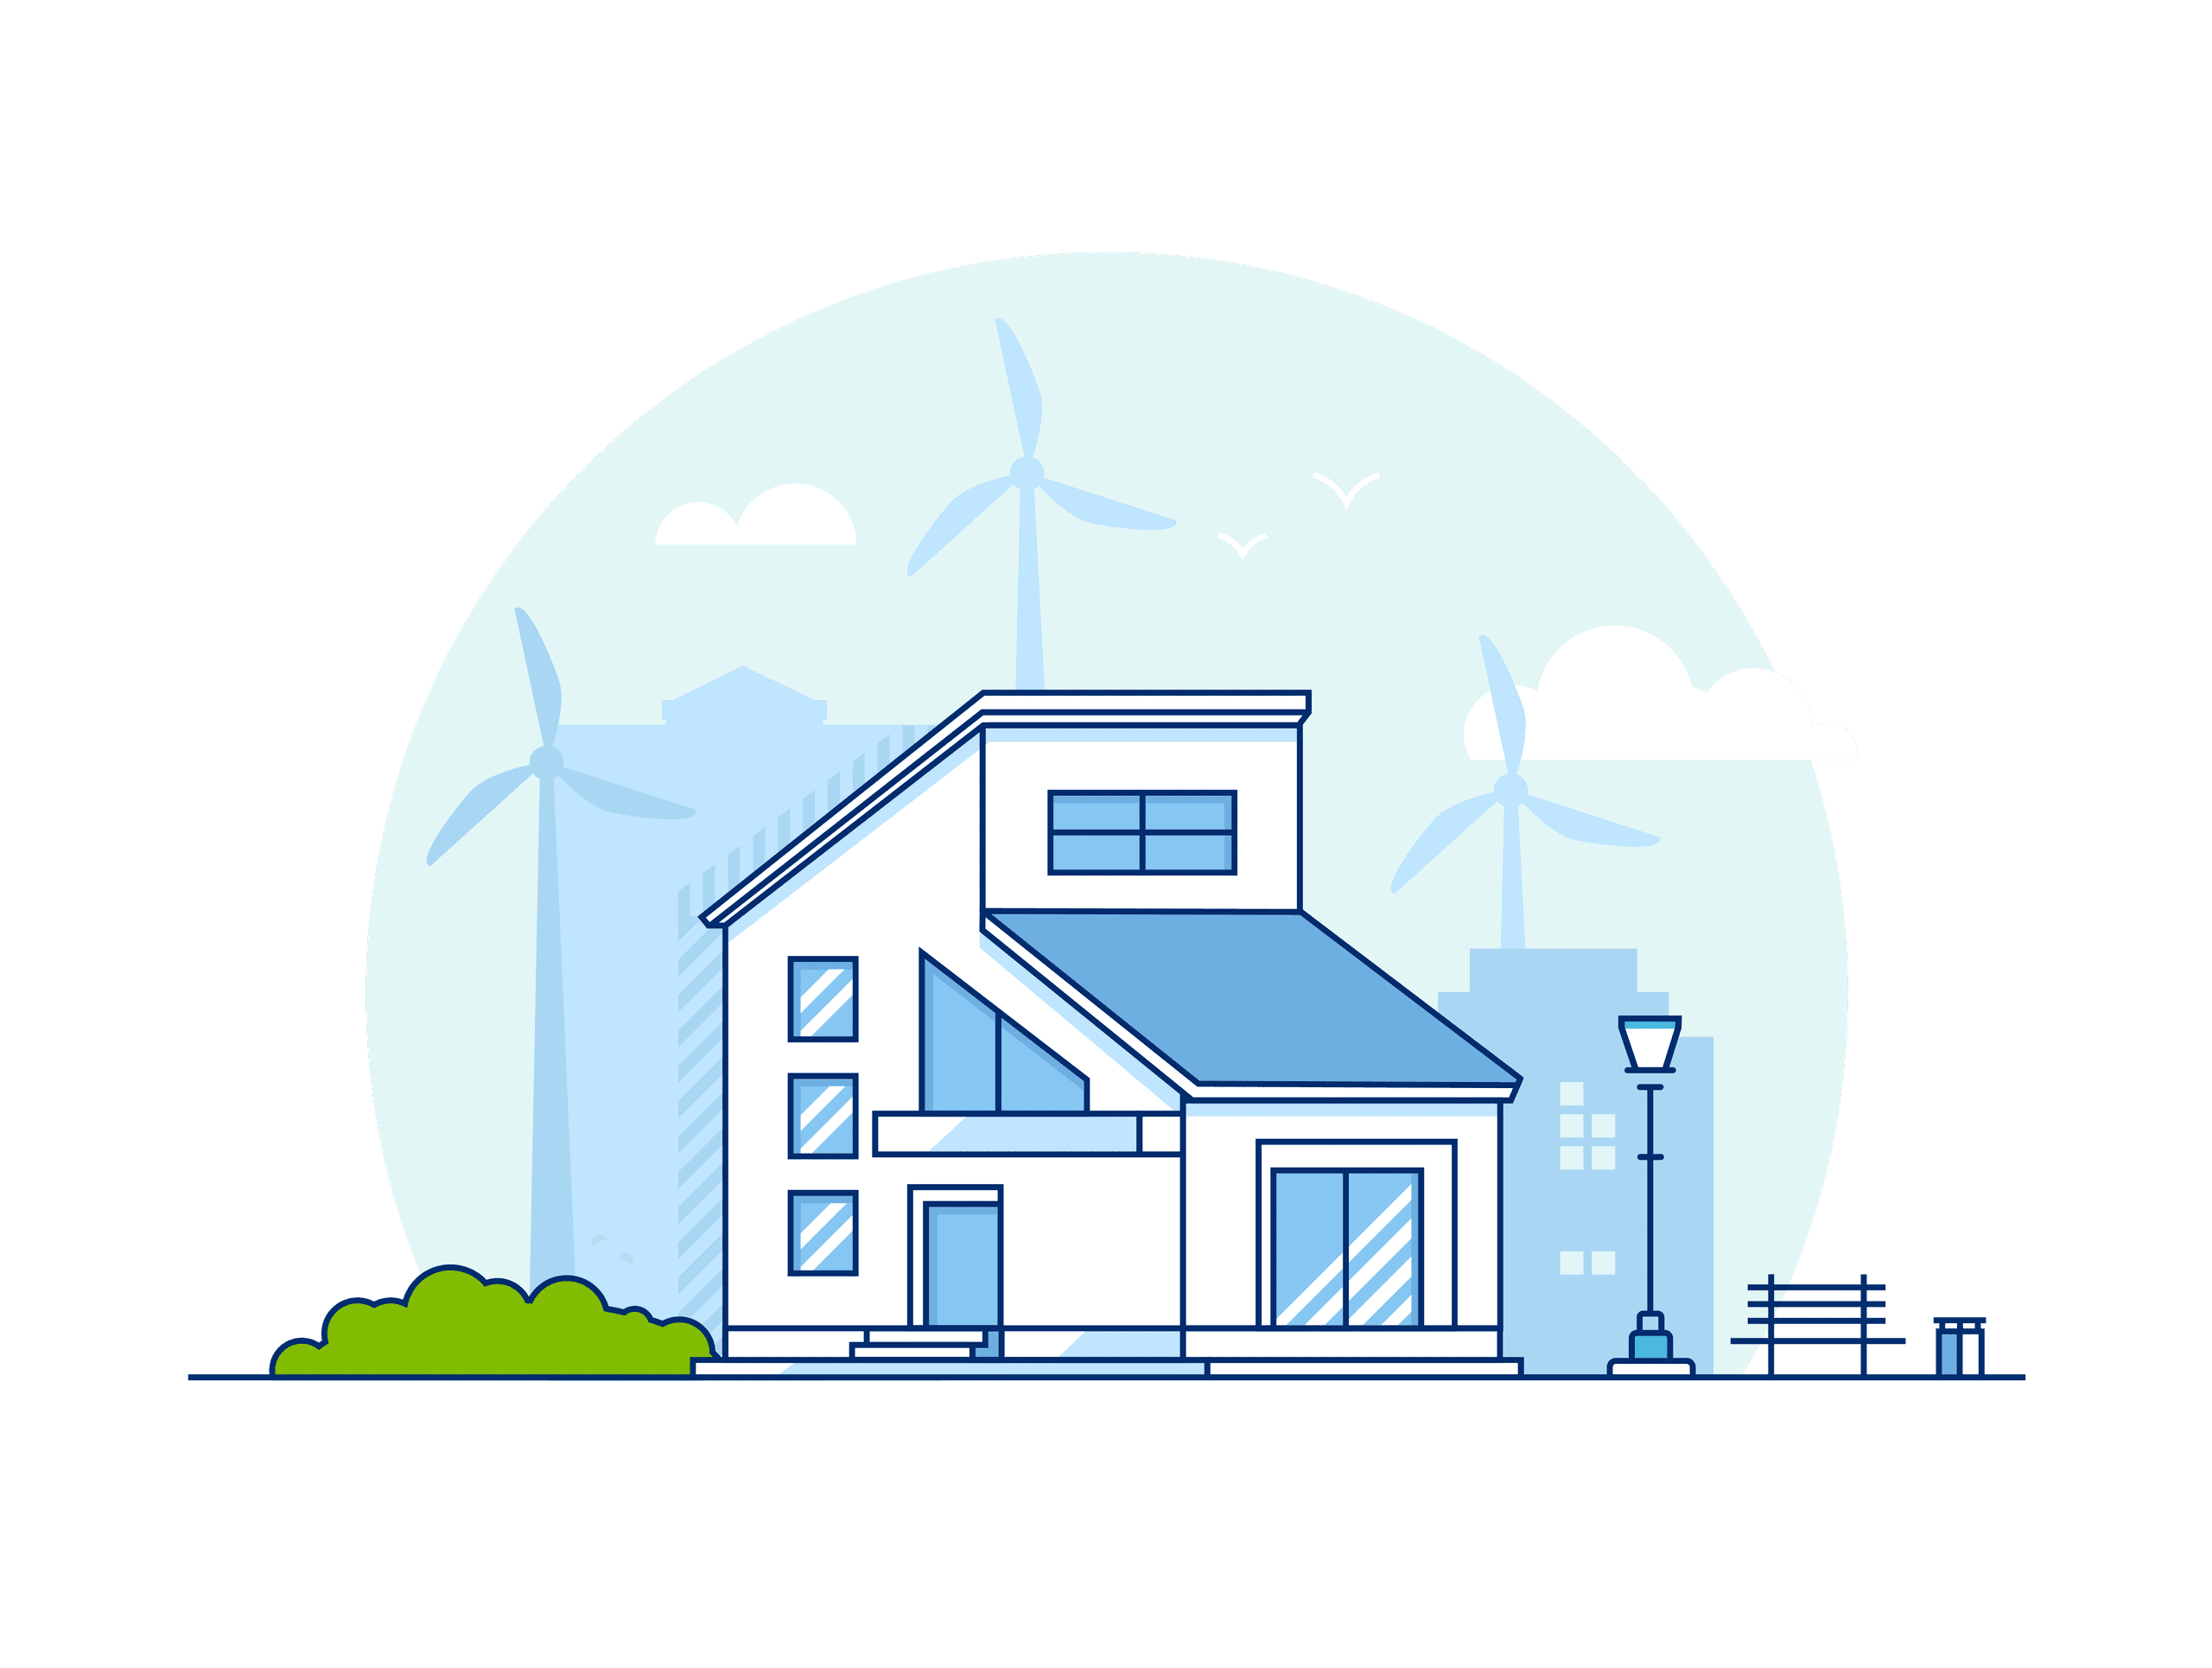 A House Image